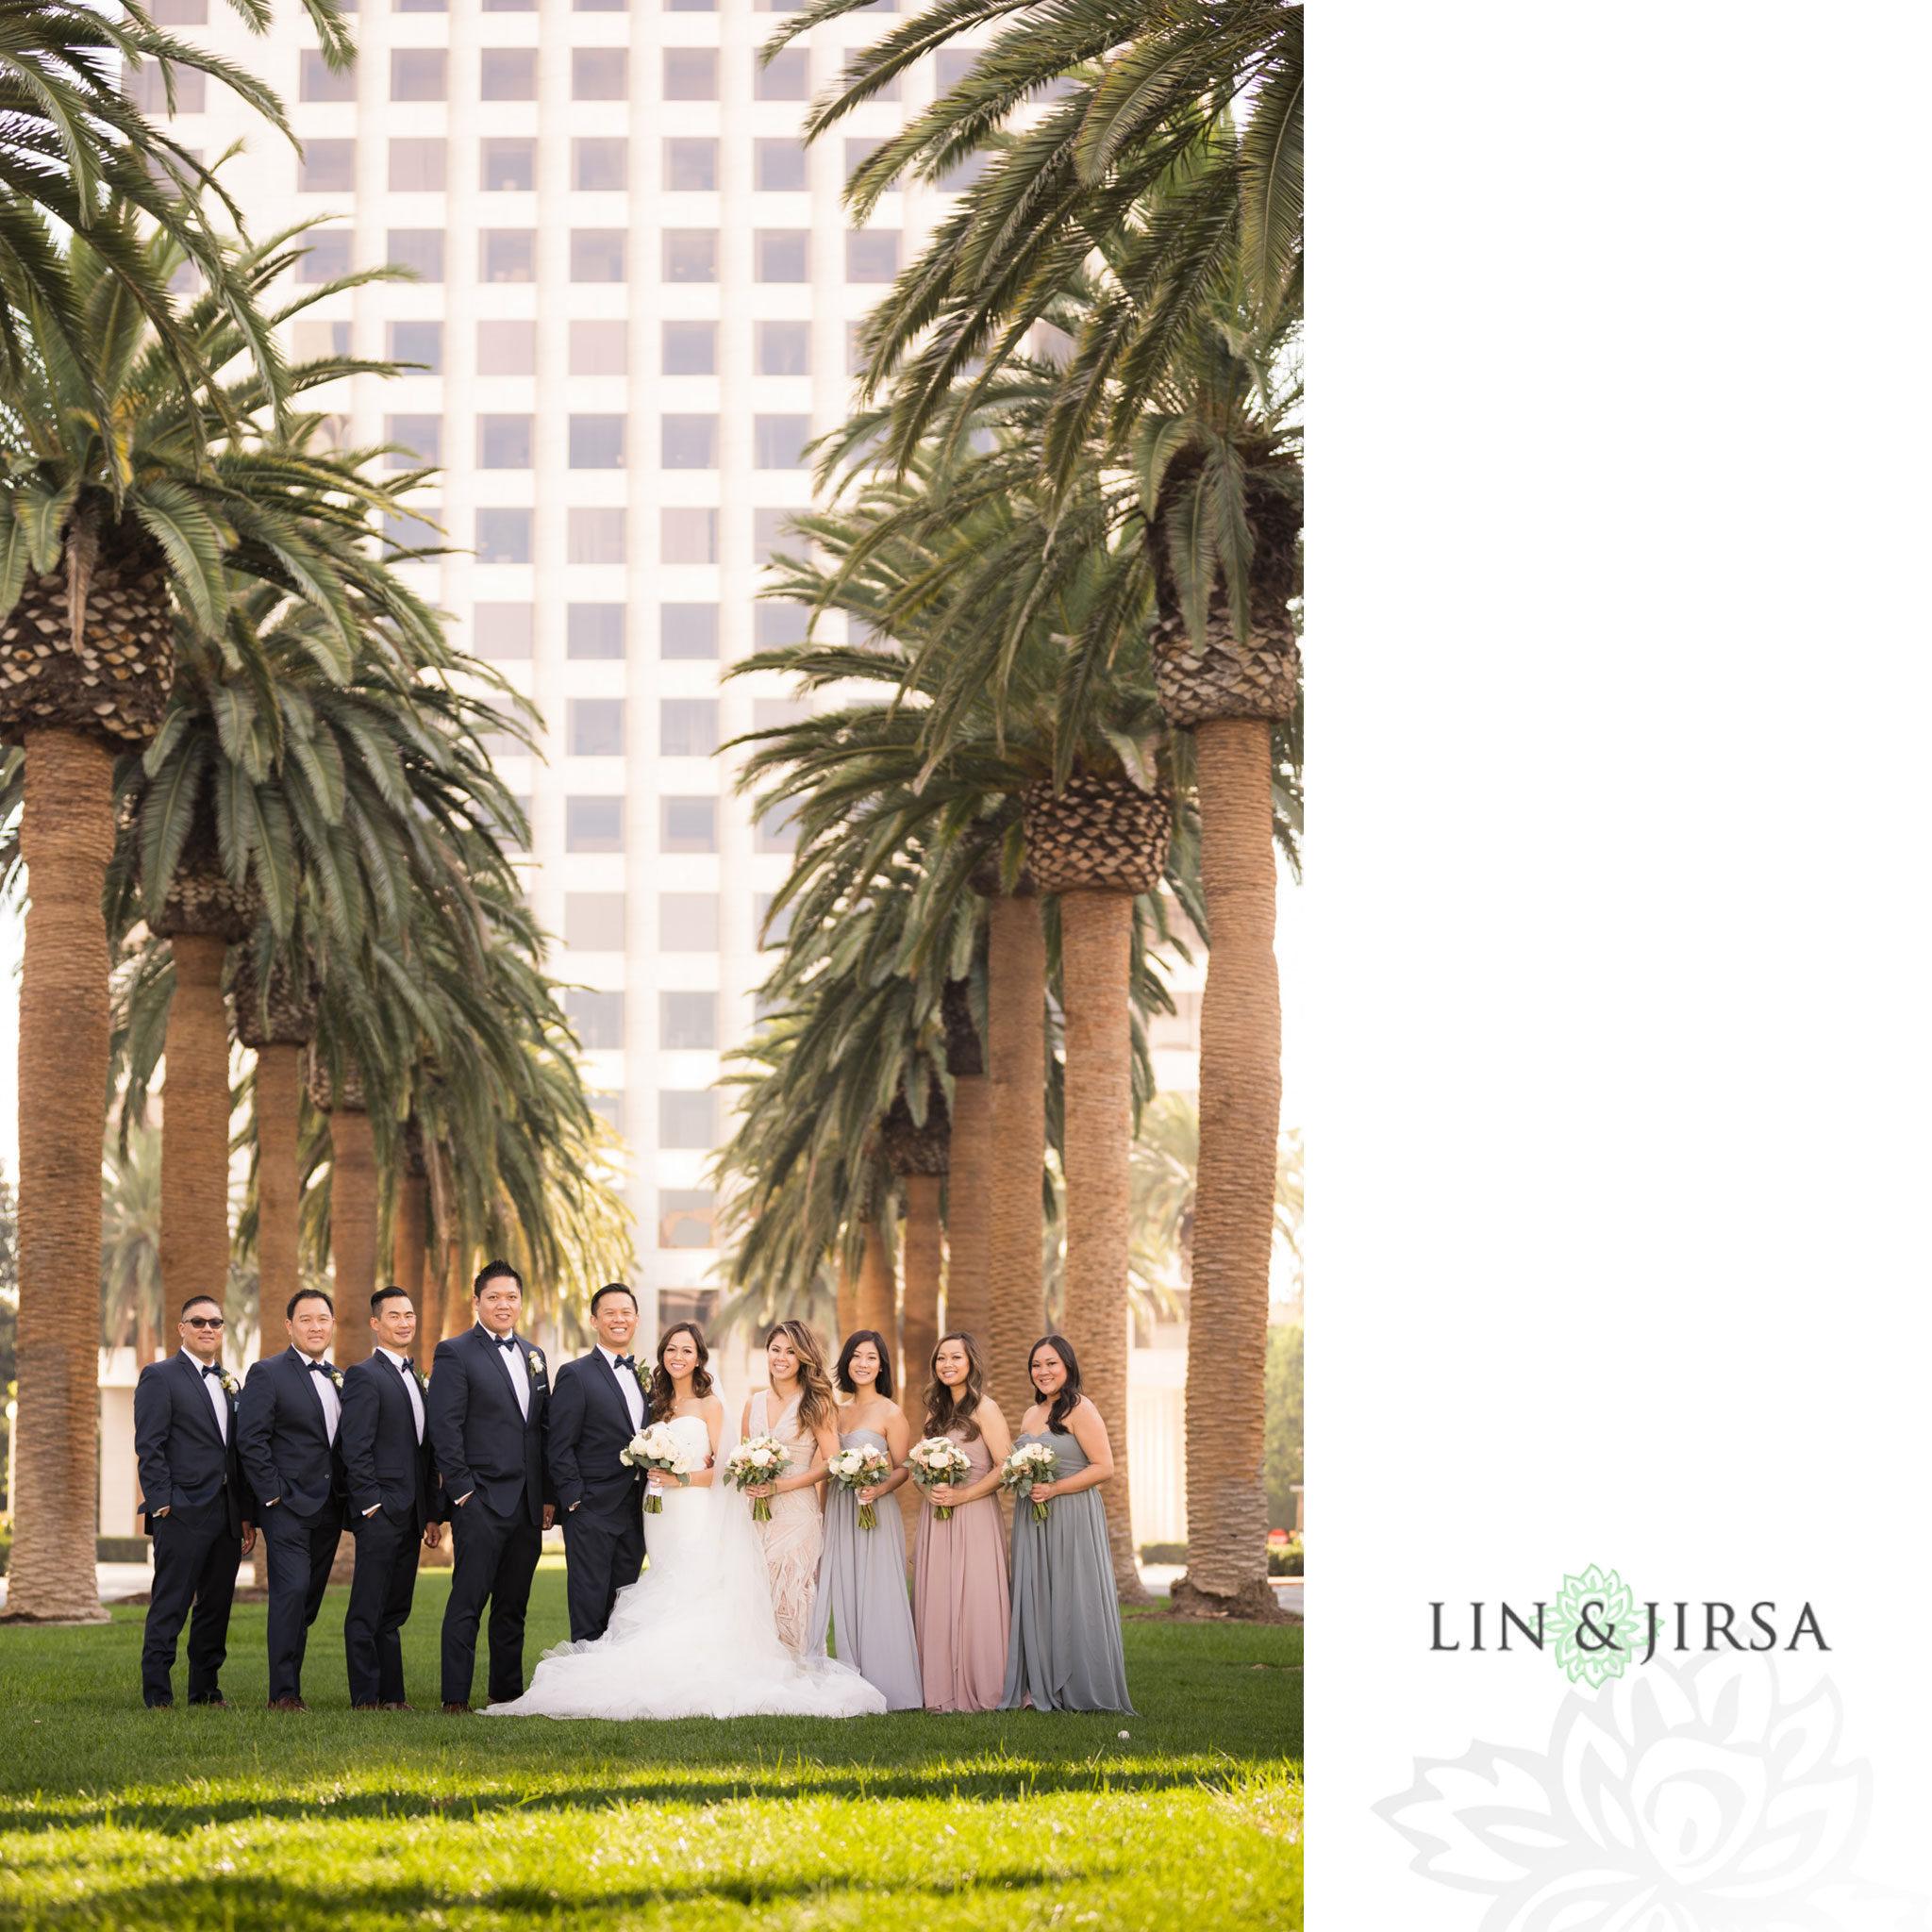 20 hotel irvine orange county wedding photography